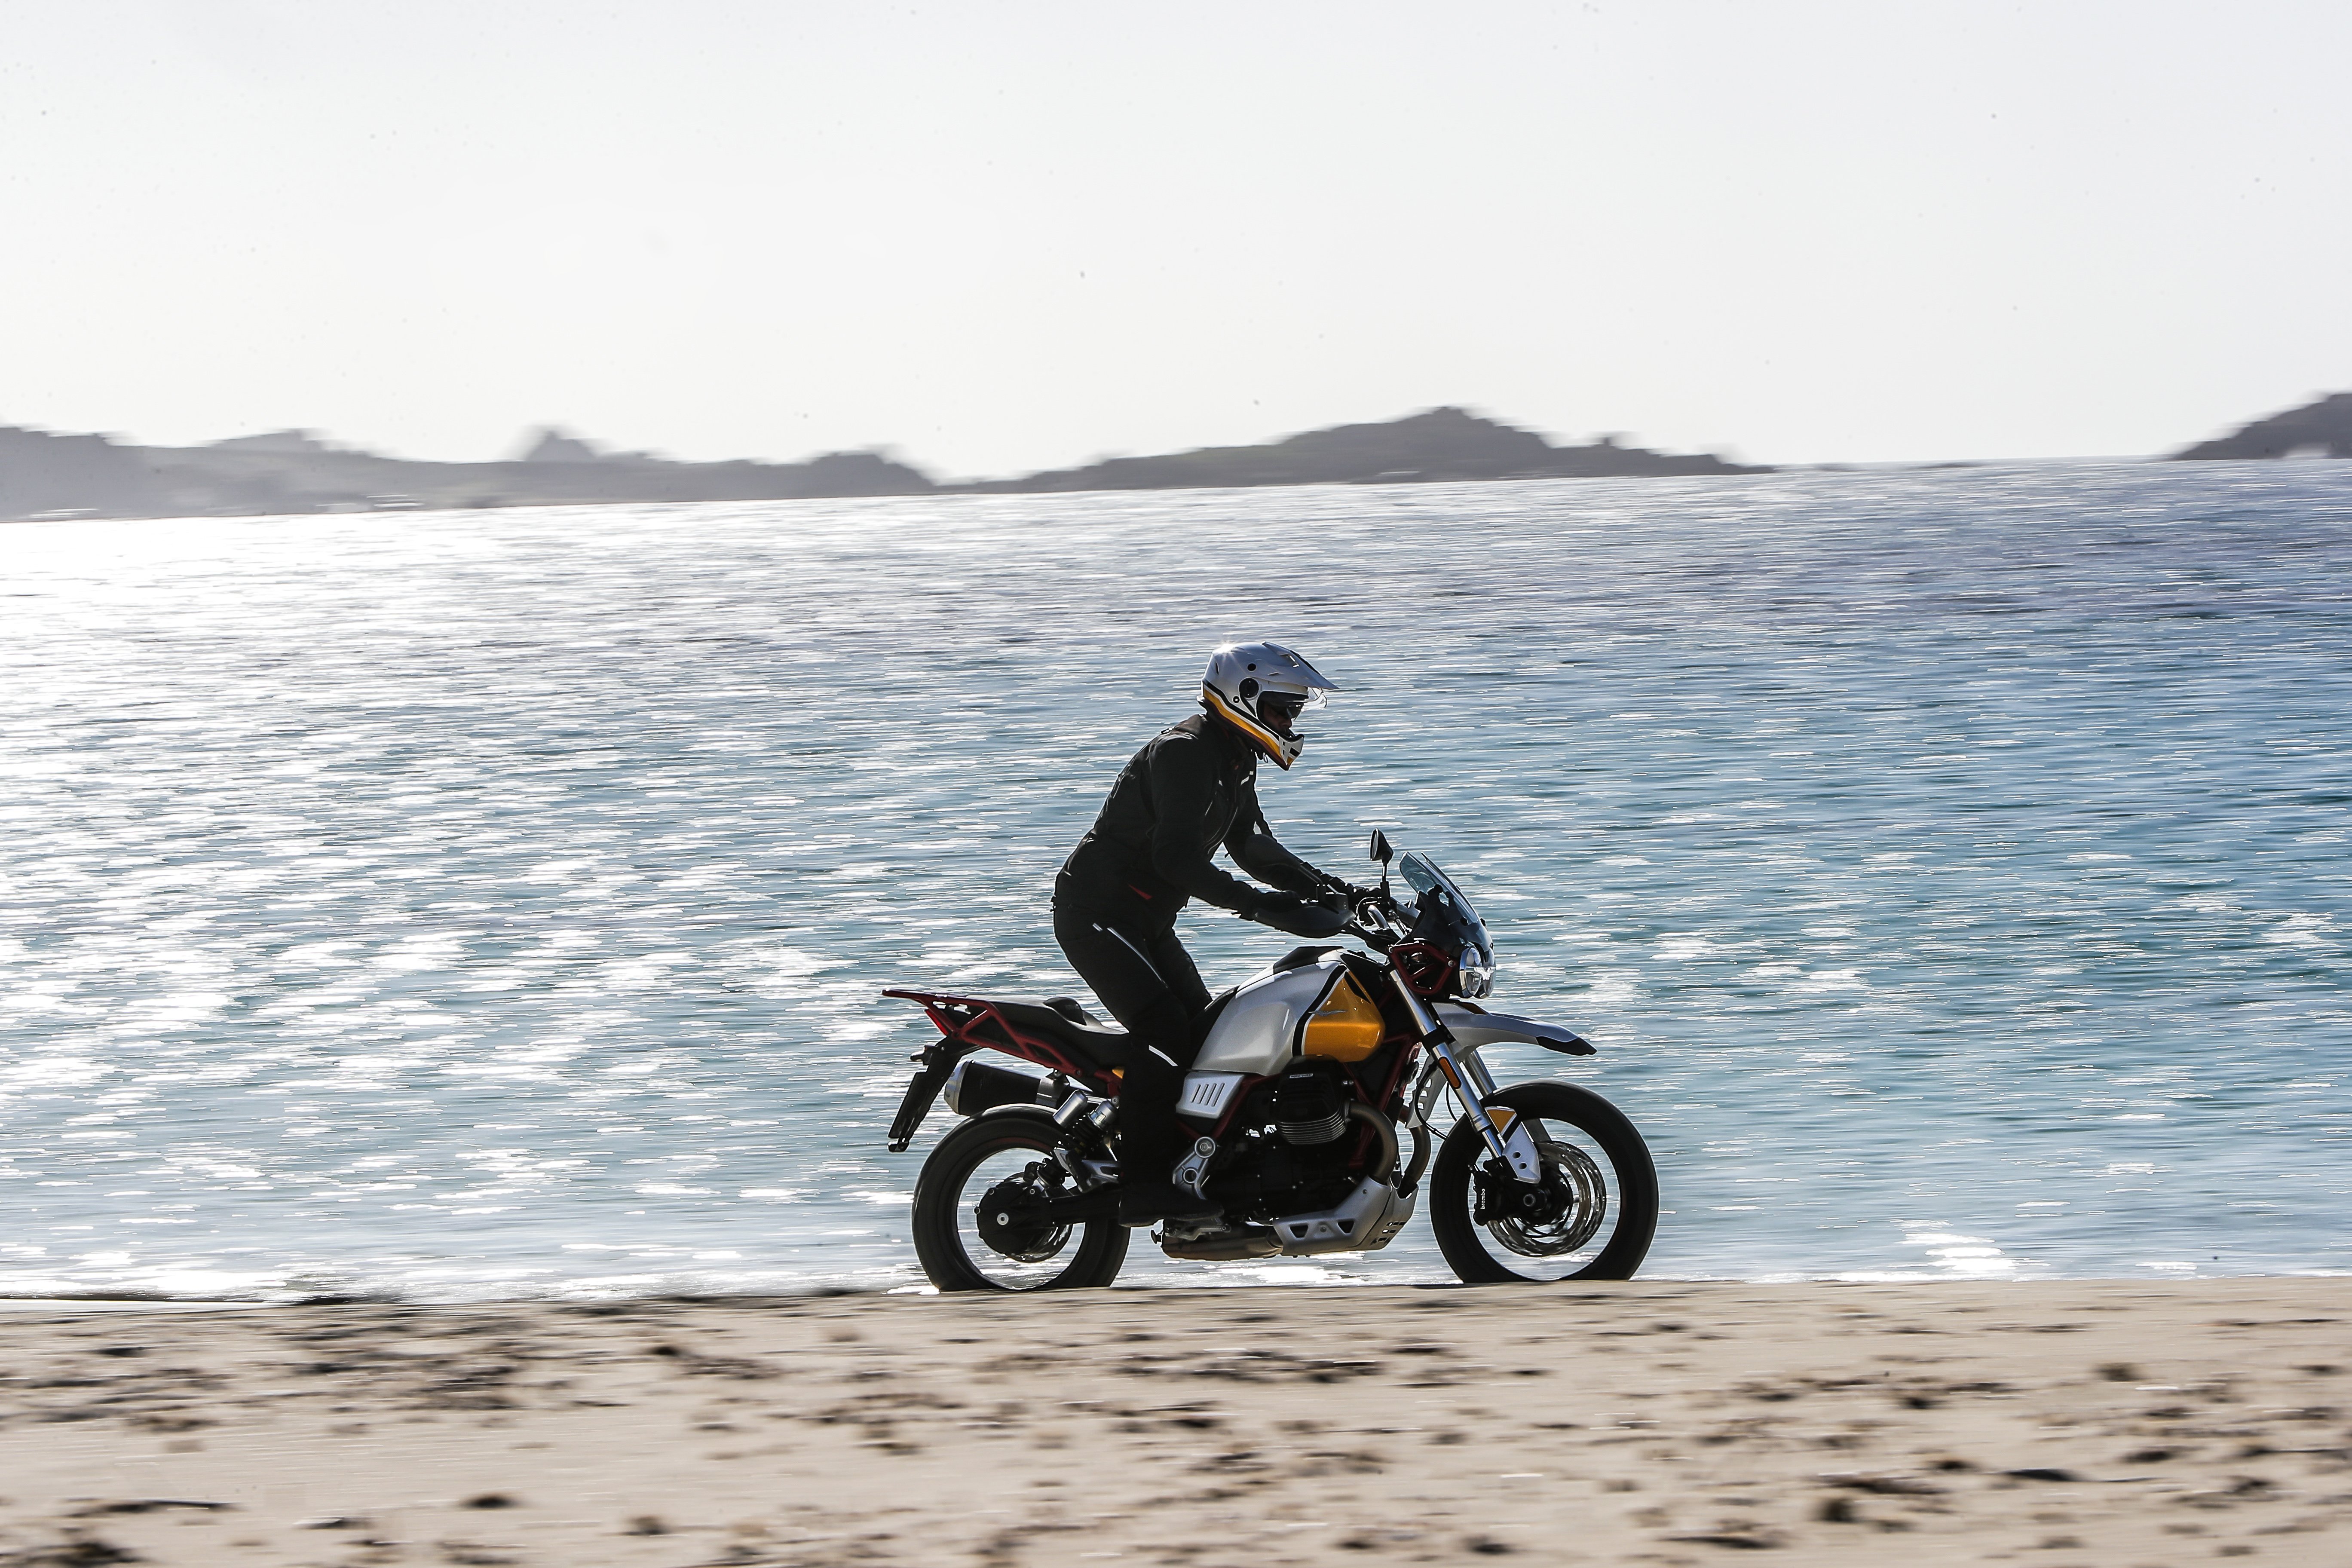 Moto Guzzi V85TT sober la arena